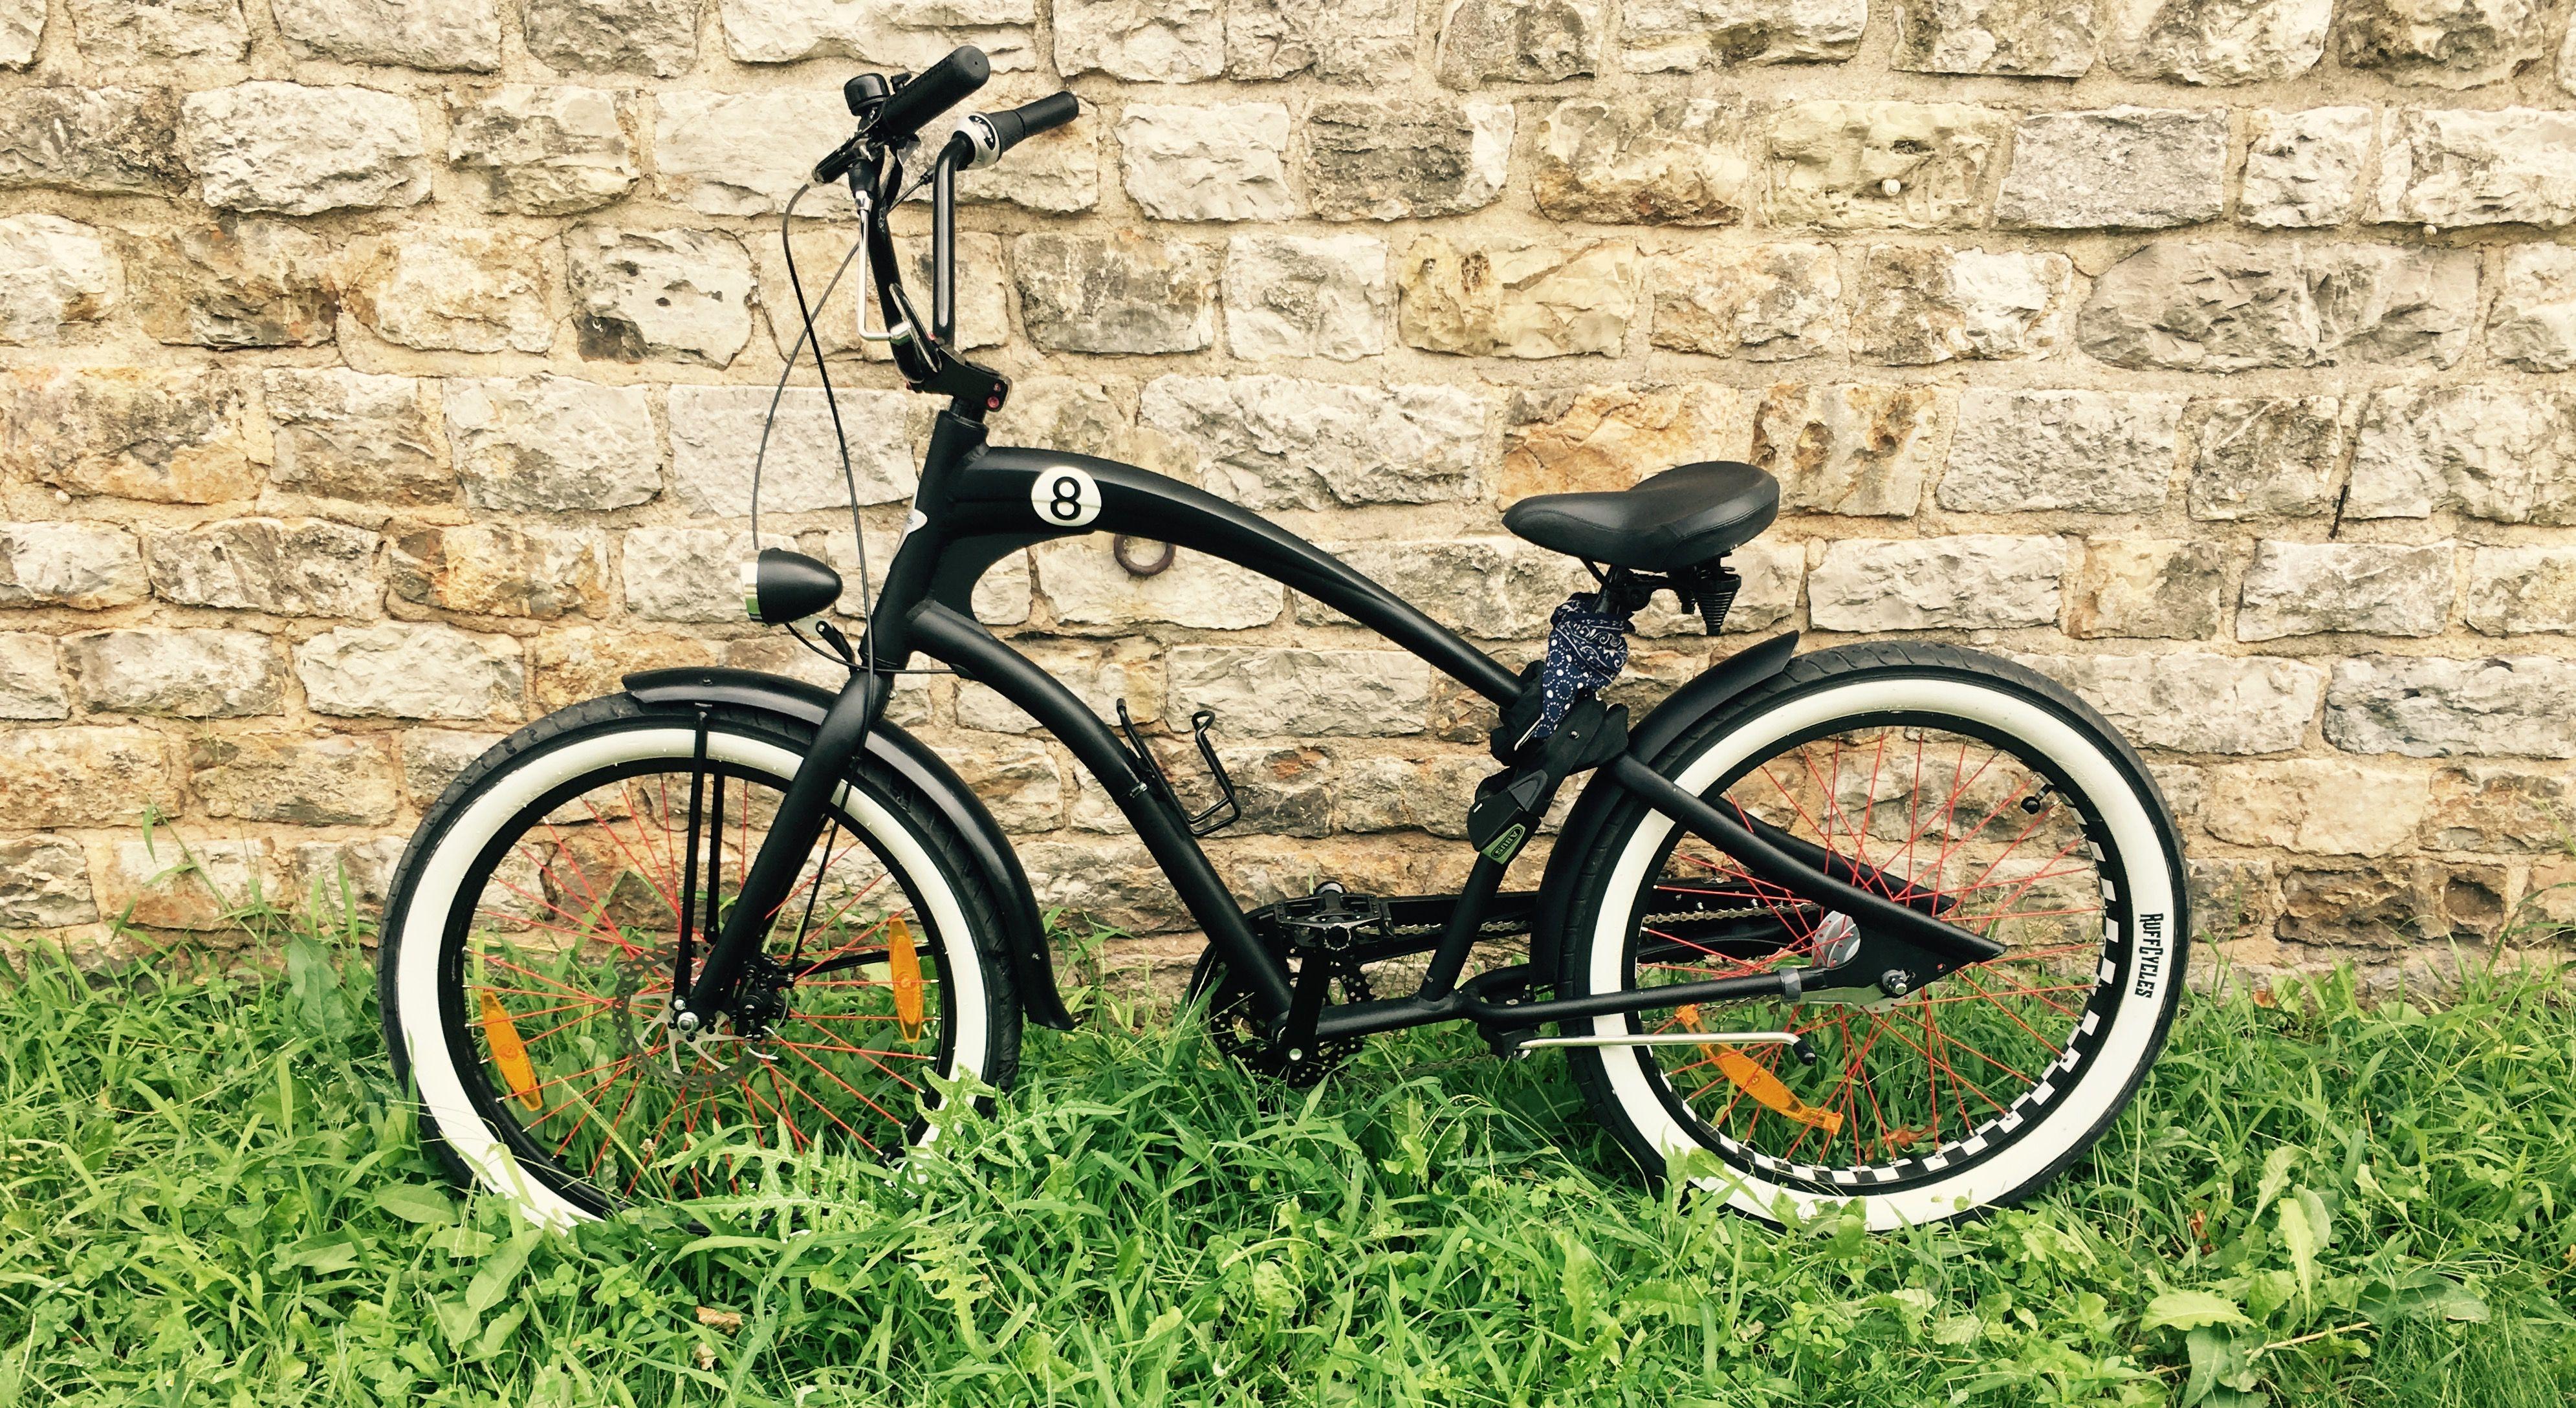 Electra Straight 8 custom | Chopper bike | Pinterest